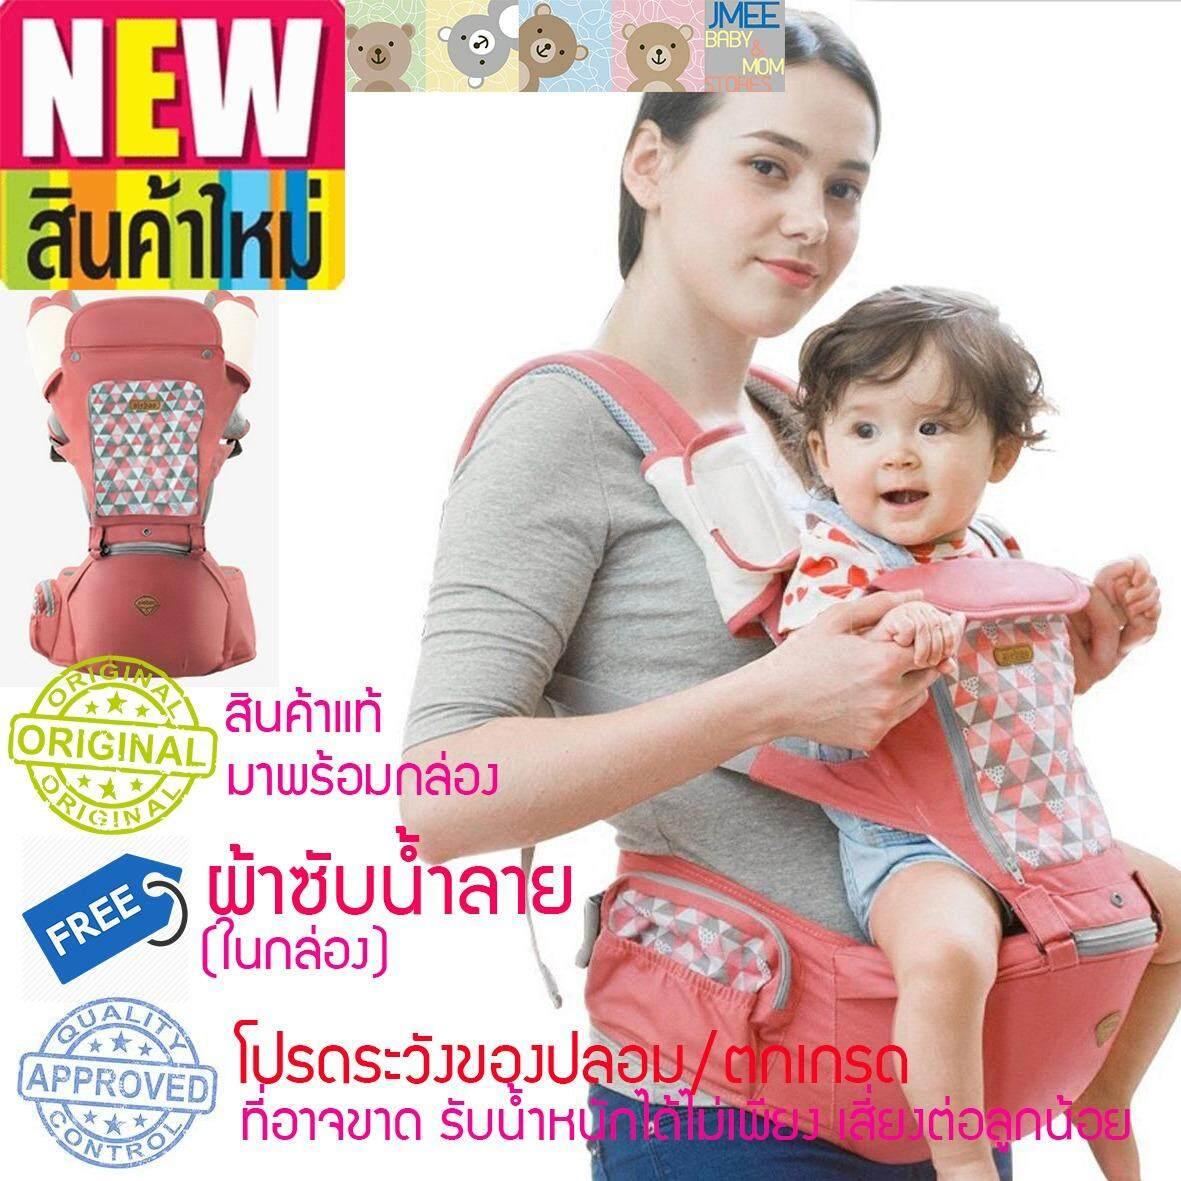 JMEE BABY LOVE เป้อุ้มเด็ก Hip Seat ของแท้ สีชมพู Pastel มีหมวกคลุมและปลอกกันน้ำลาย สะพายหน้า สะพายหลัง รับน้ำหนักได้ 20 kg - Toddler baby Hip Seat Carrier ตรวจคุณภาพก่อนส่ง QC Passed & Safety ส่งจากไทย